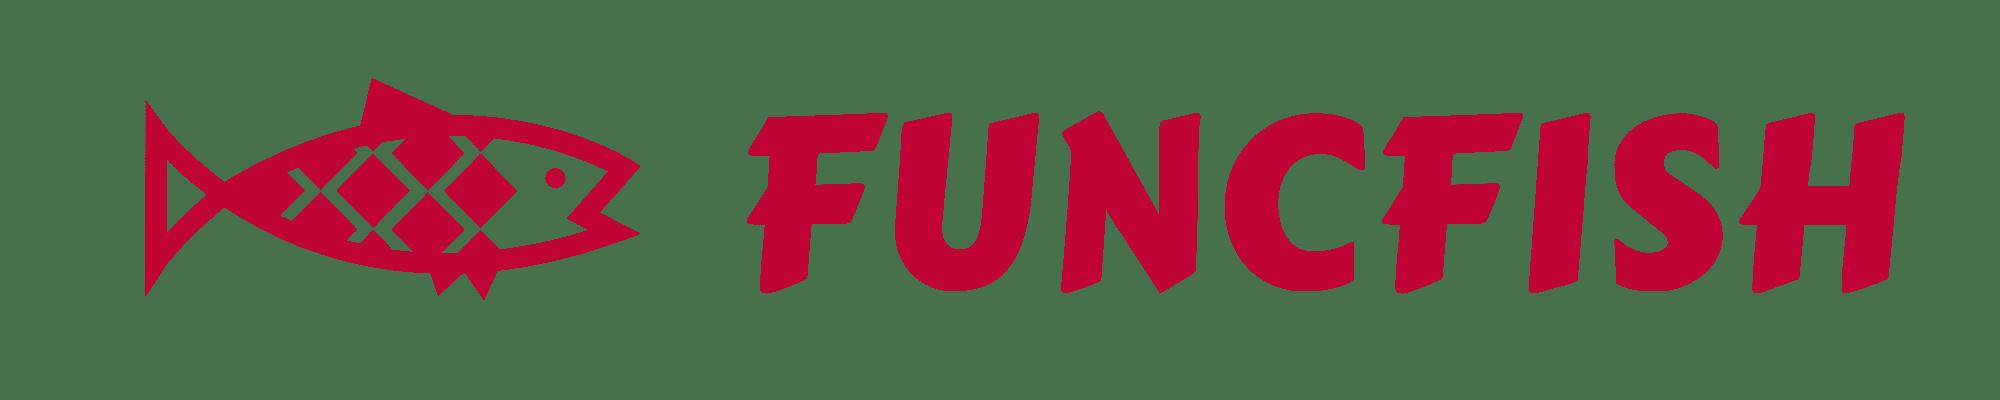 FuncFish